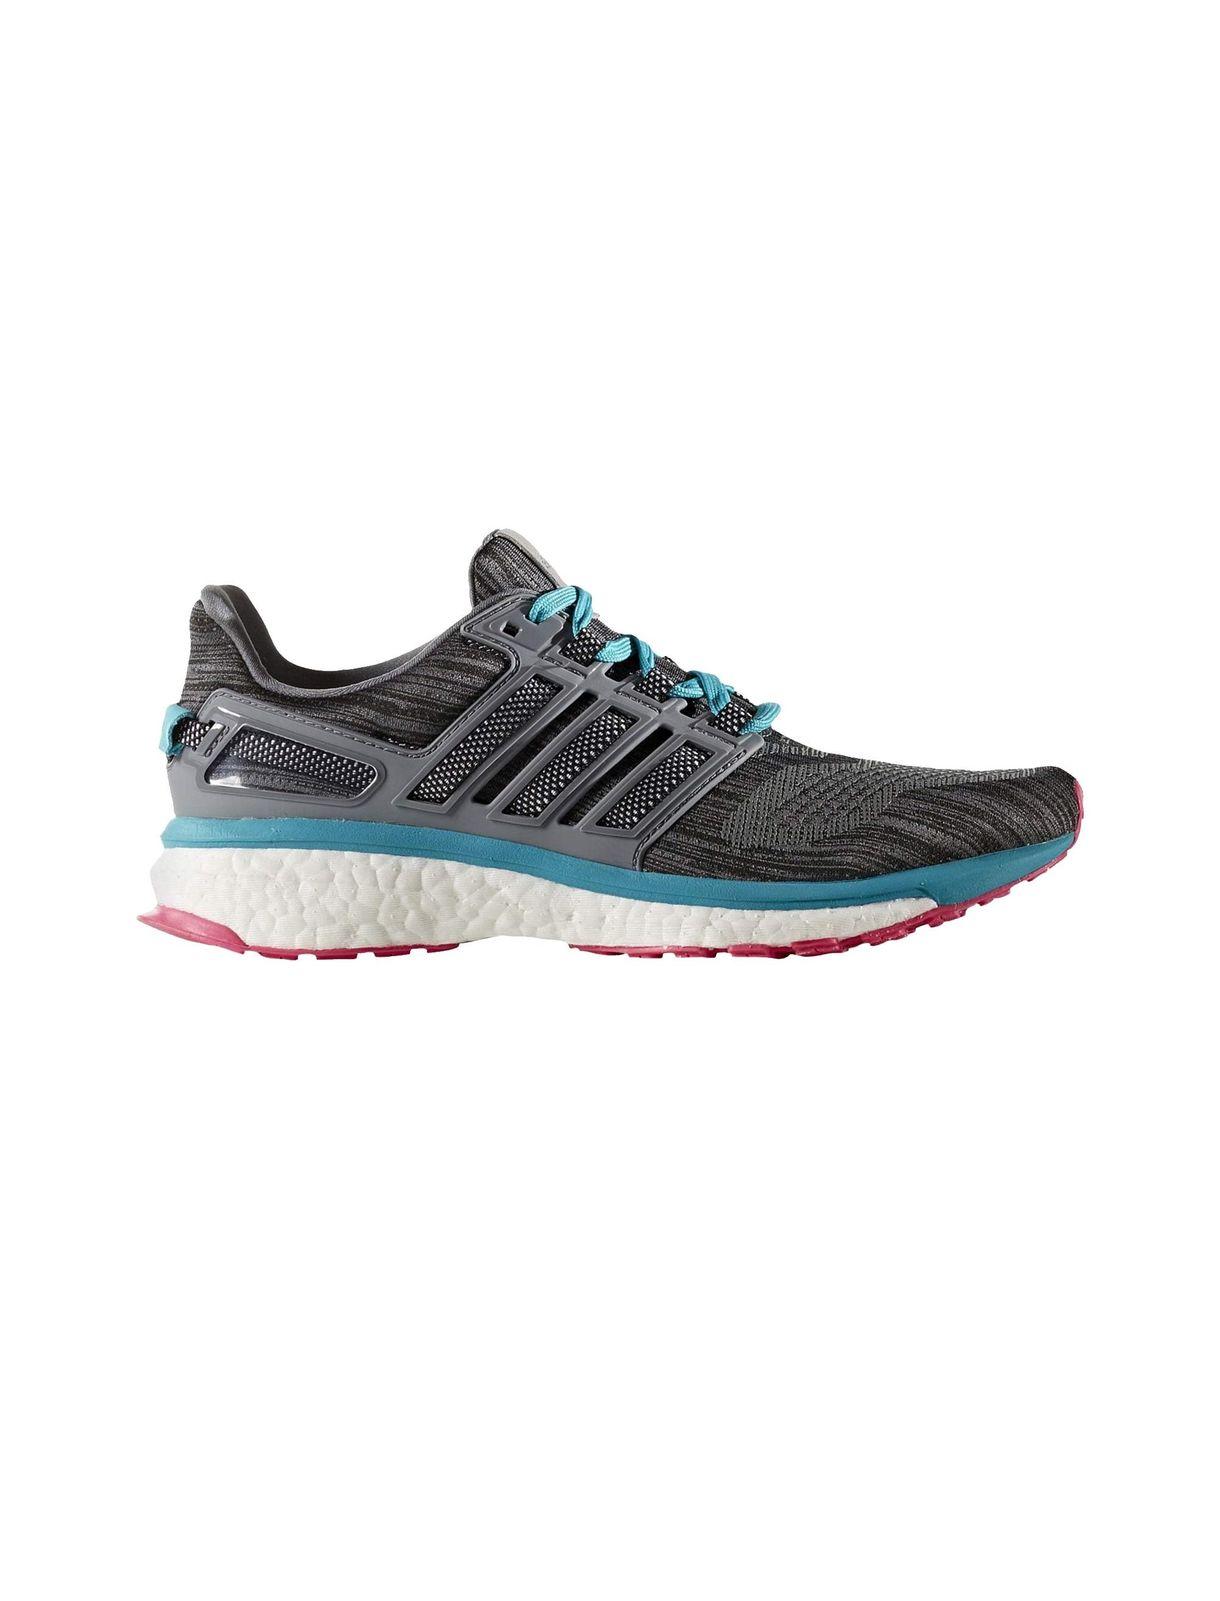 کفش مخصوص دویدن زنانه آدیداس مدل BB5792  Adidas BB5792 Running Lace-Up Shoes For Women